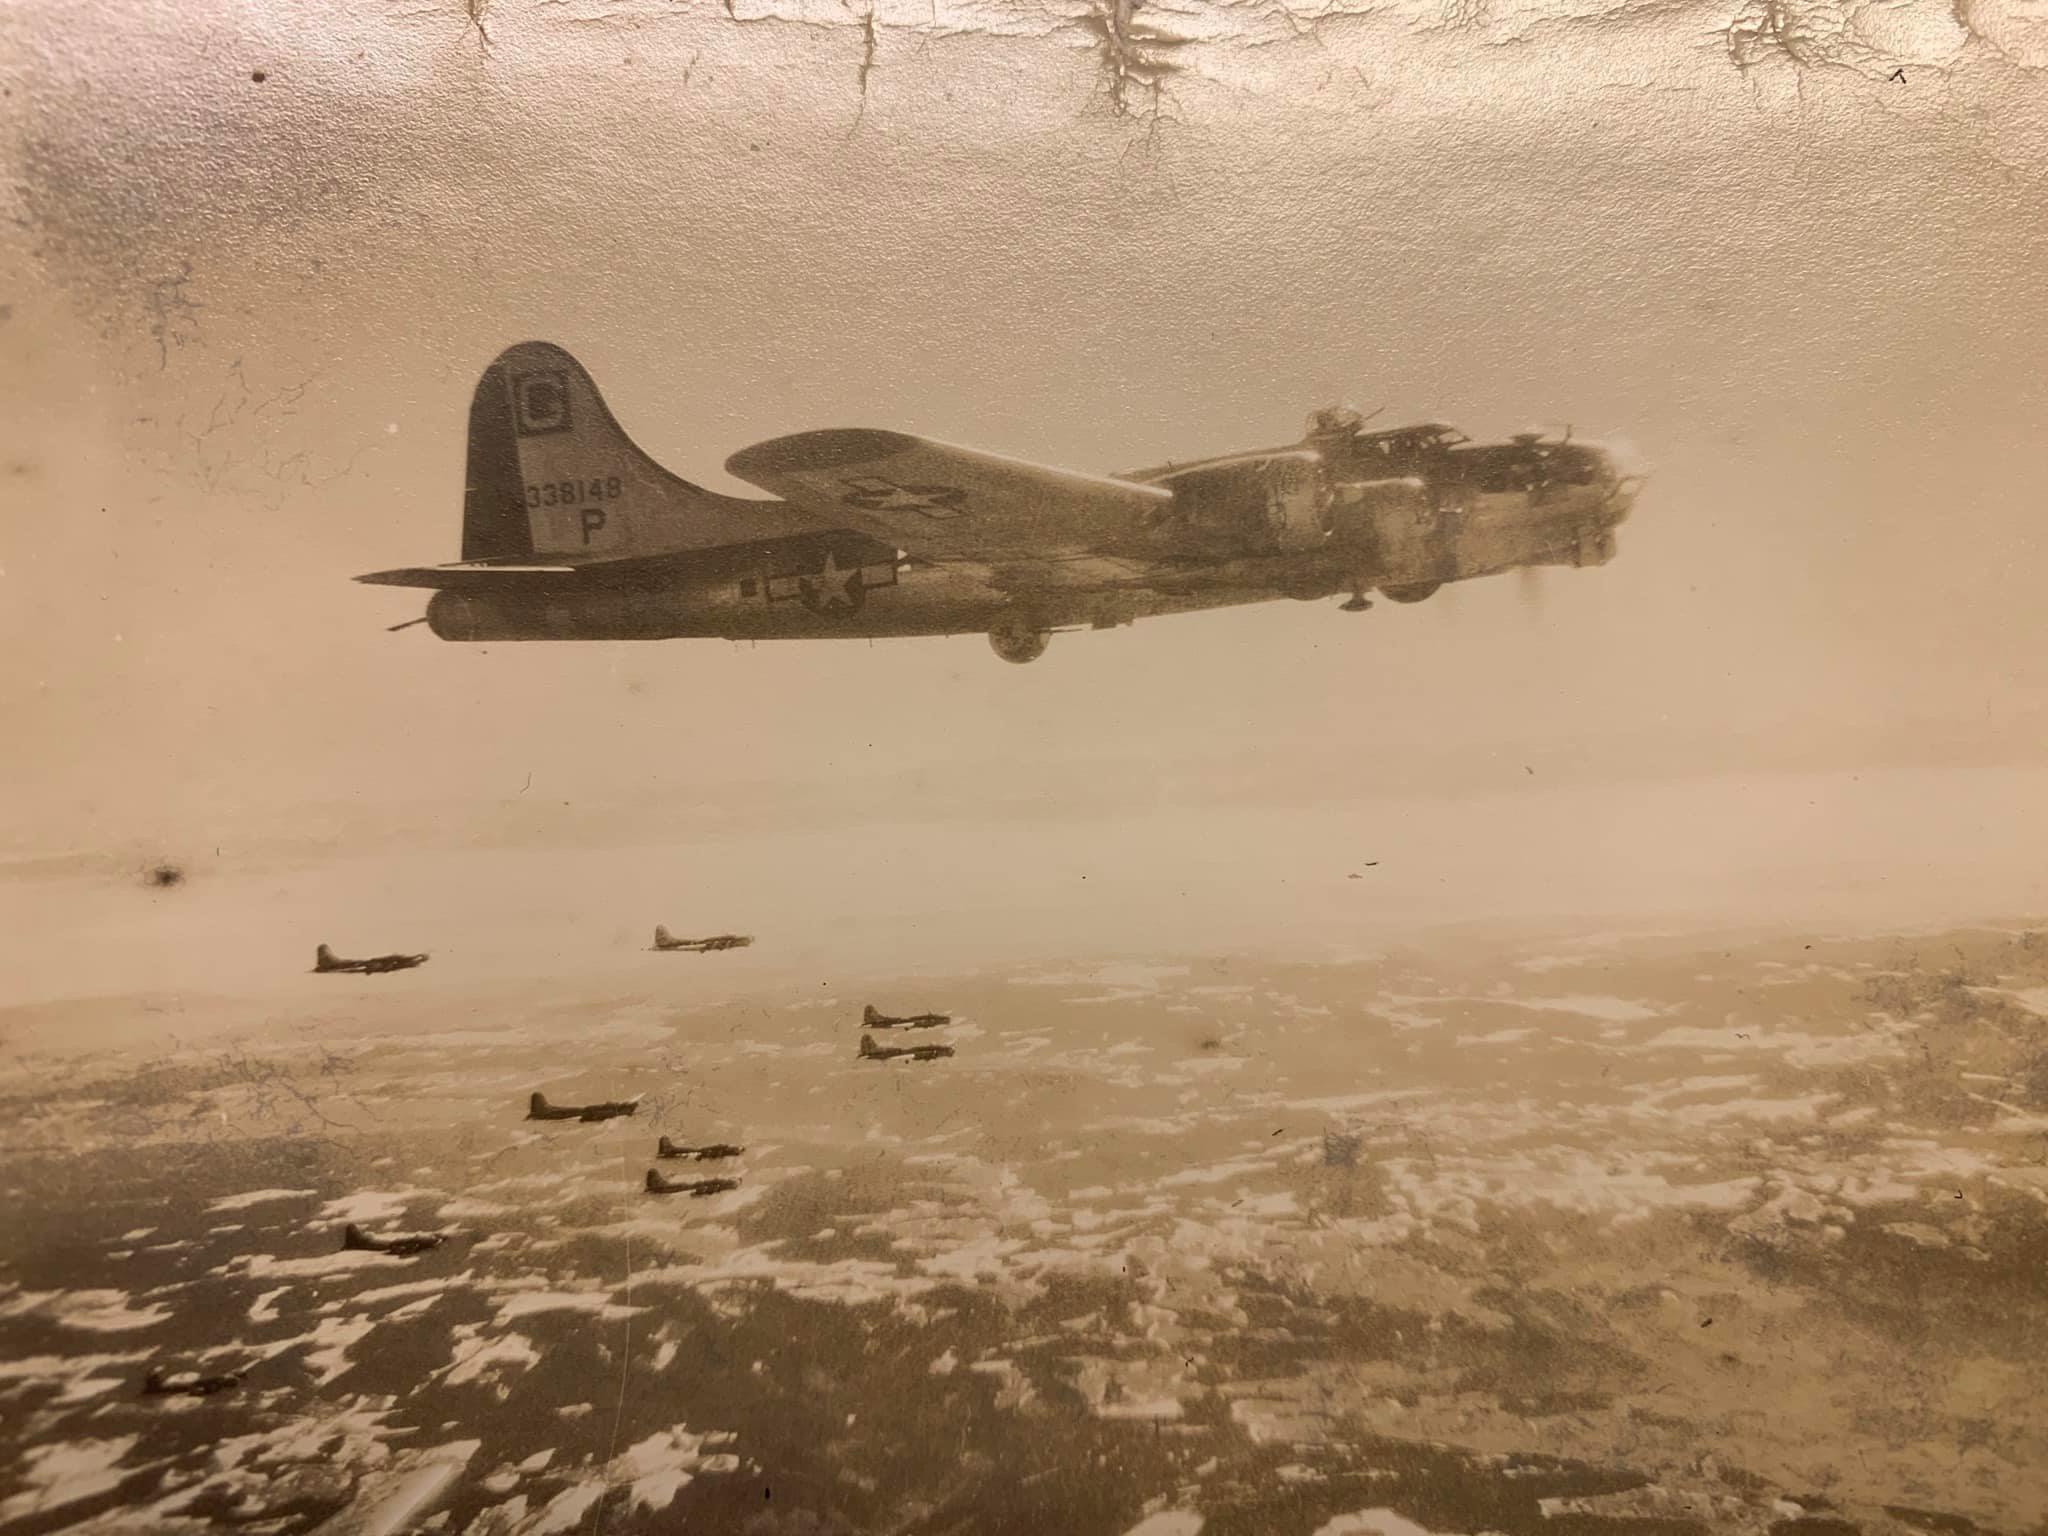 B-17 #43-38148